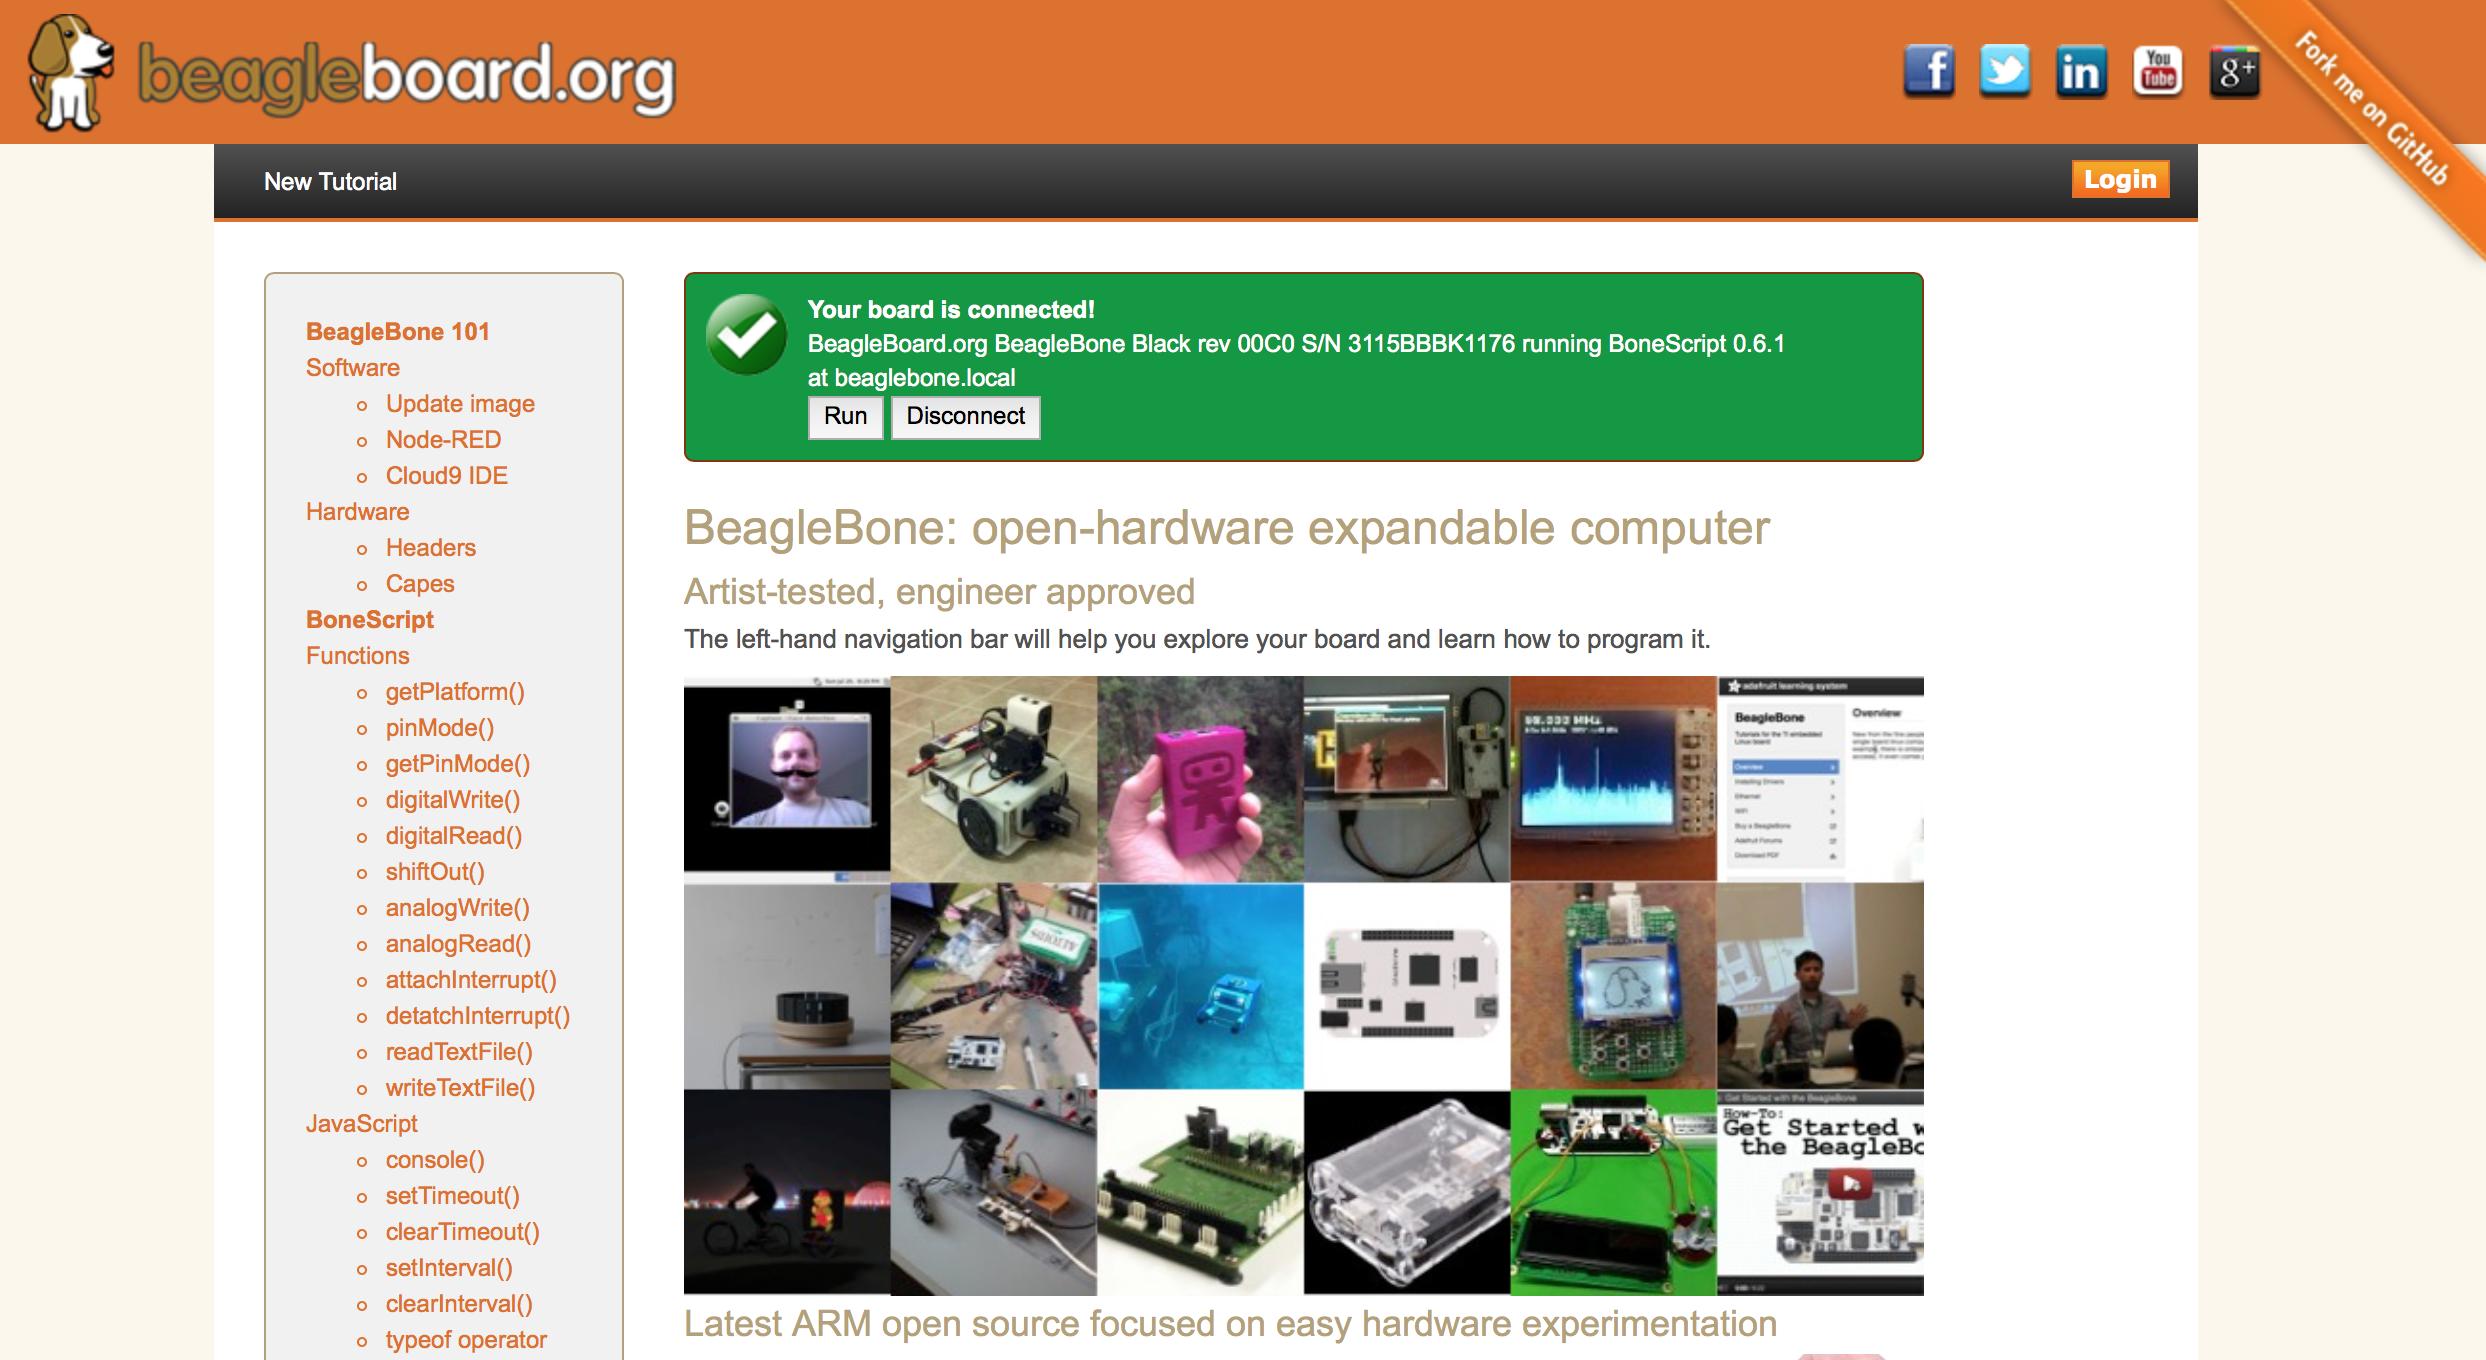 mac で BeagleBoneBlack(BBB) に Debian(8 8) をのせて WiFi (WN-G300UA